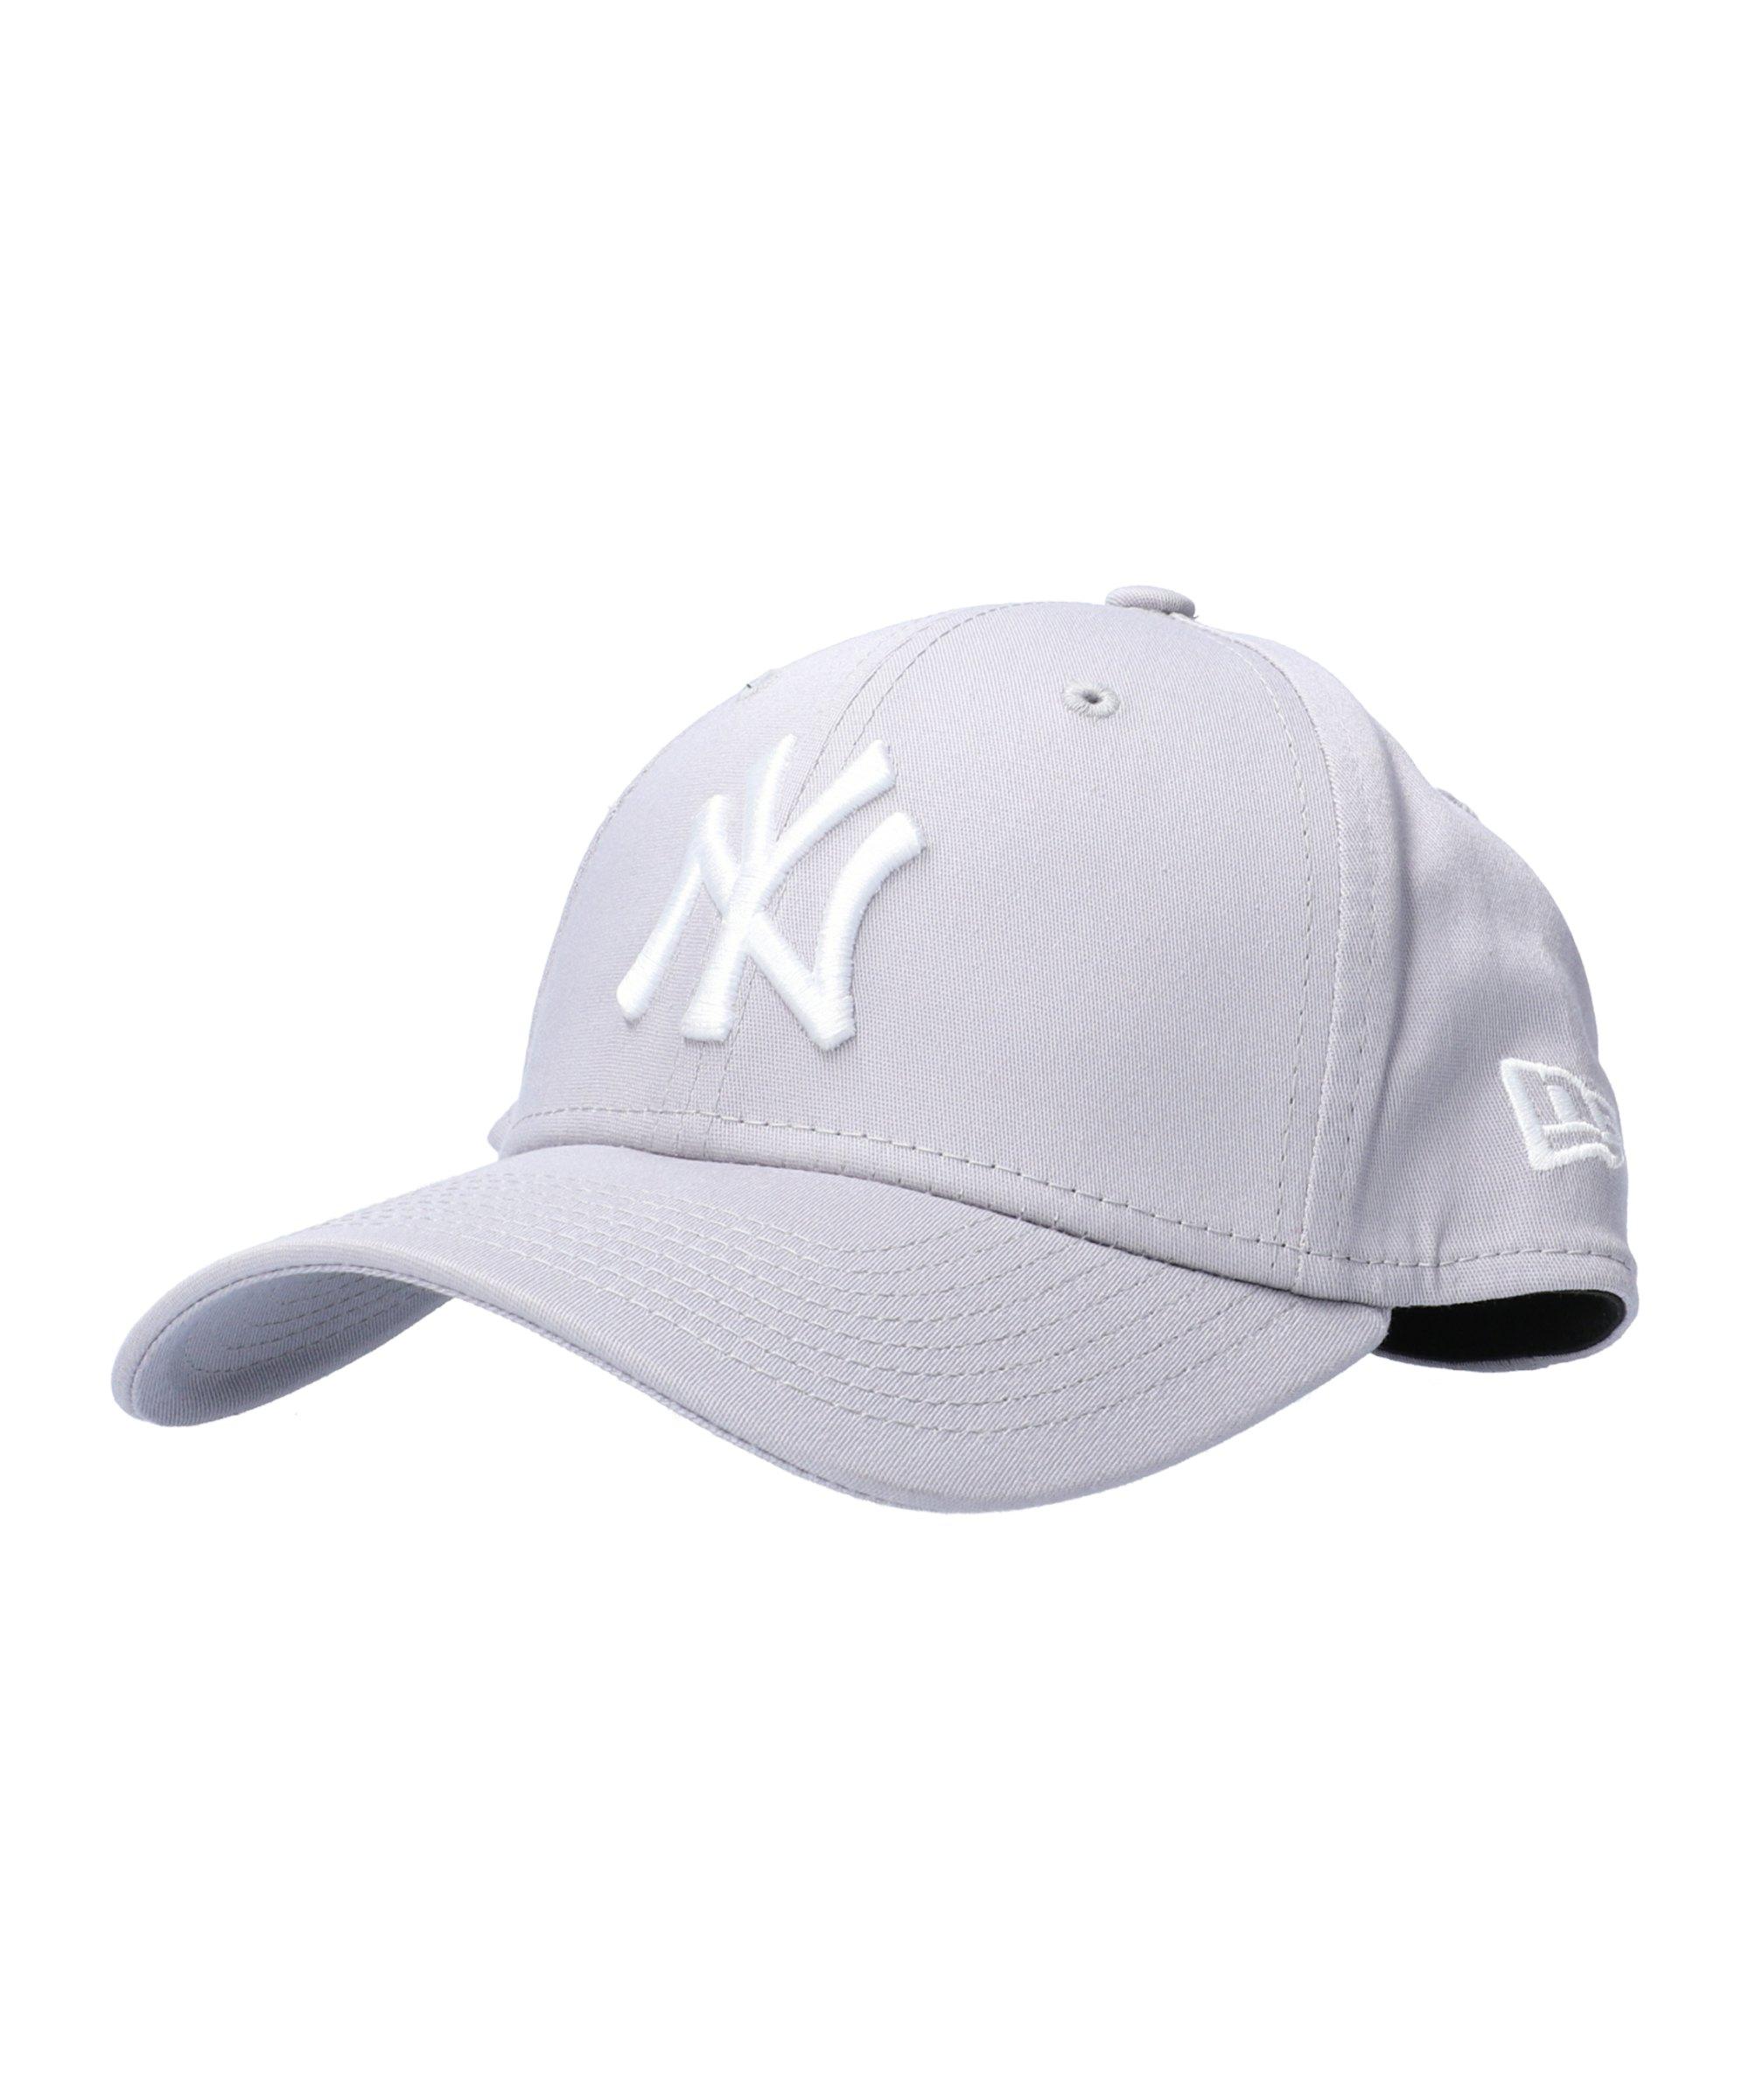 New Era NY Yankees 39Thirty Cap Grau Weiss - grau